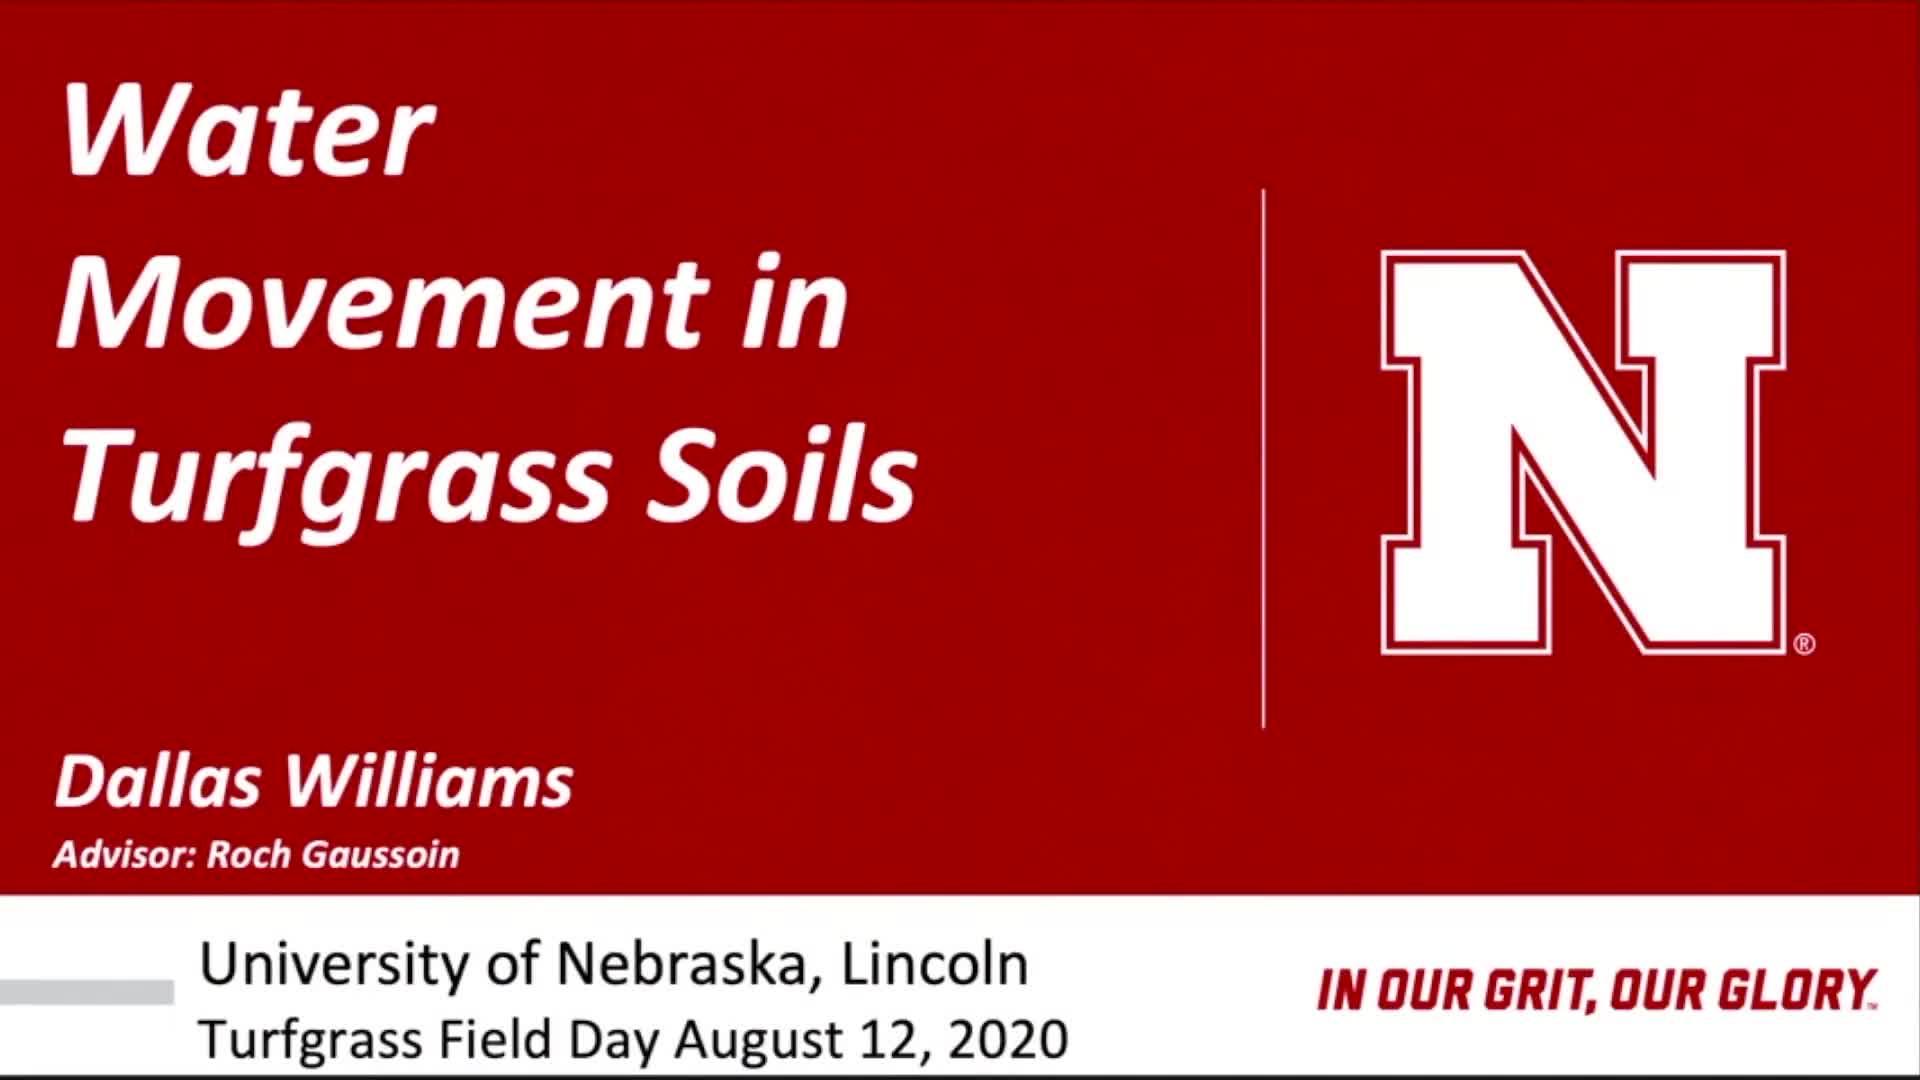 Water Movement in Turfgrass Soils